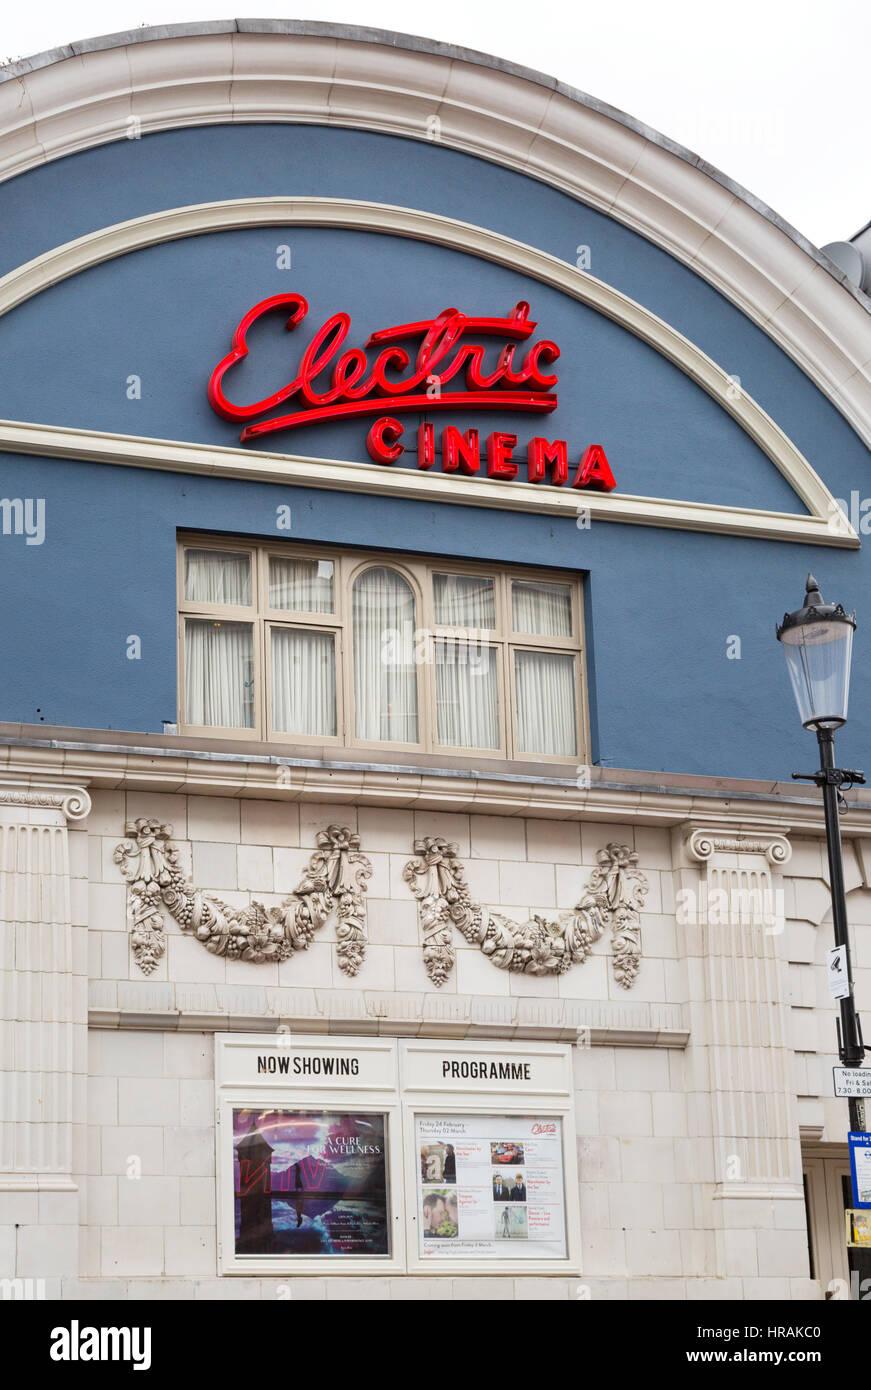 The exterior of the Electric Cinema, Portobello Road, Notting Hill, London UK - Stock Image